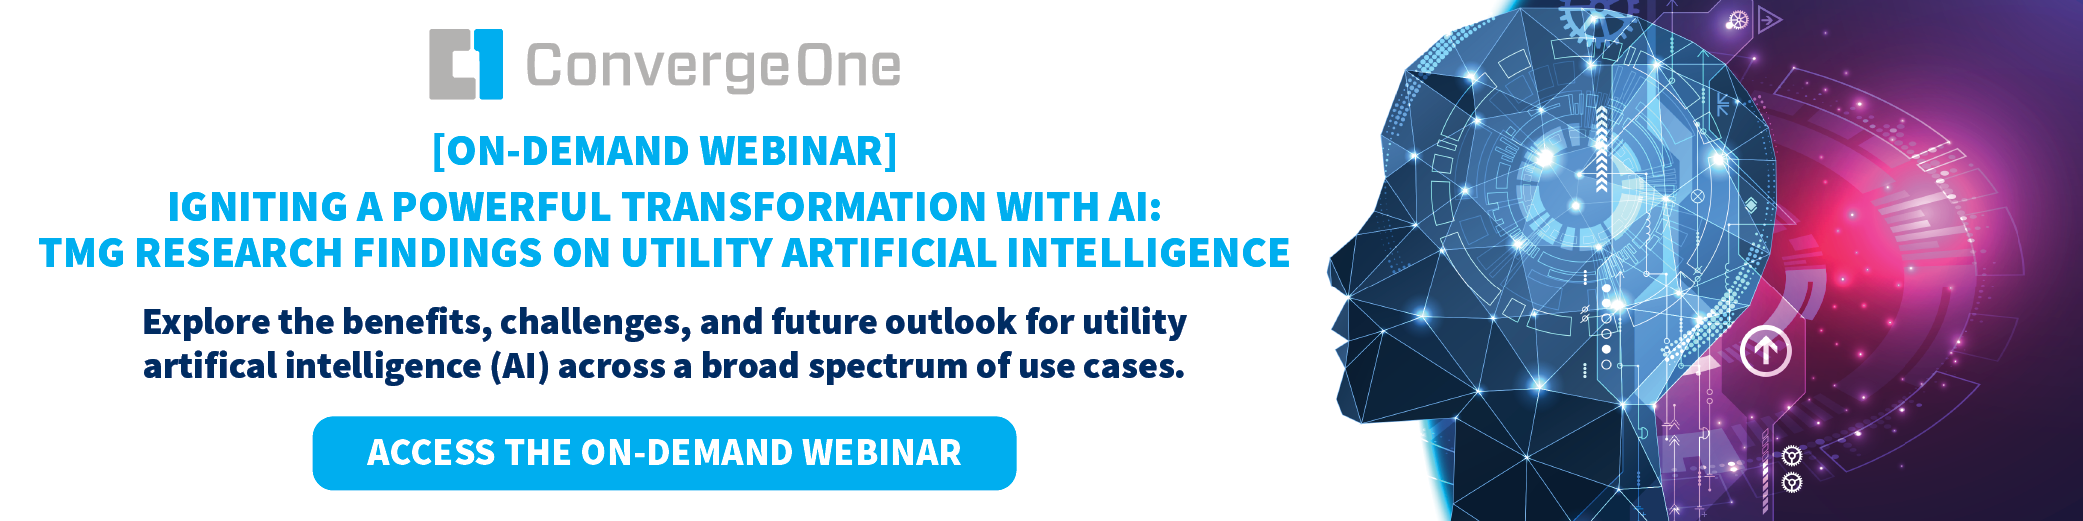 Utility Artificial Intelligence On-Demand Webinar - Watch Now